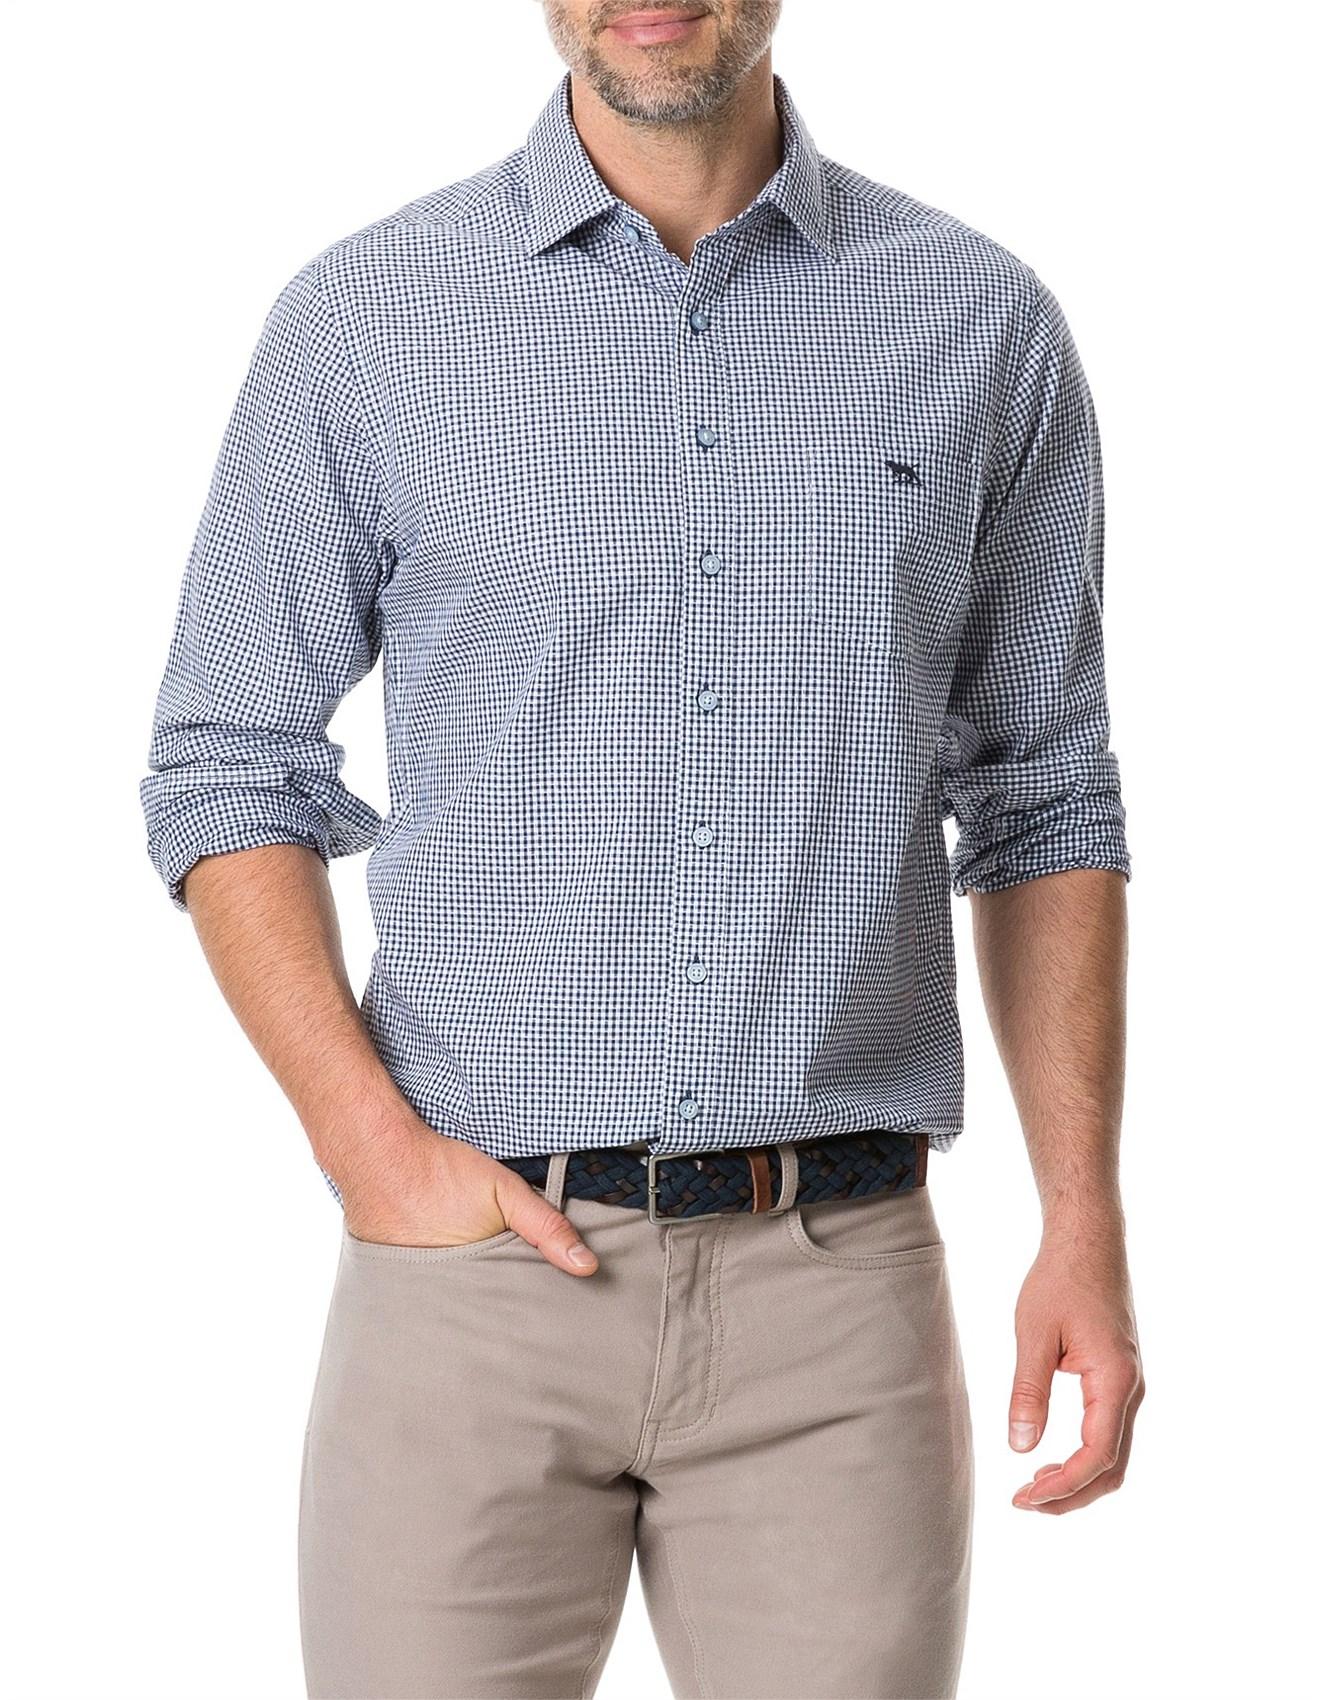 Mens Shirts Casual Shirts Dress Shirts David Jones Lp2806